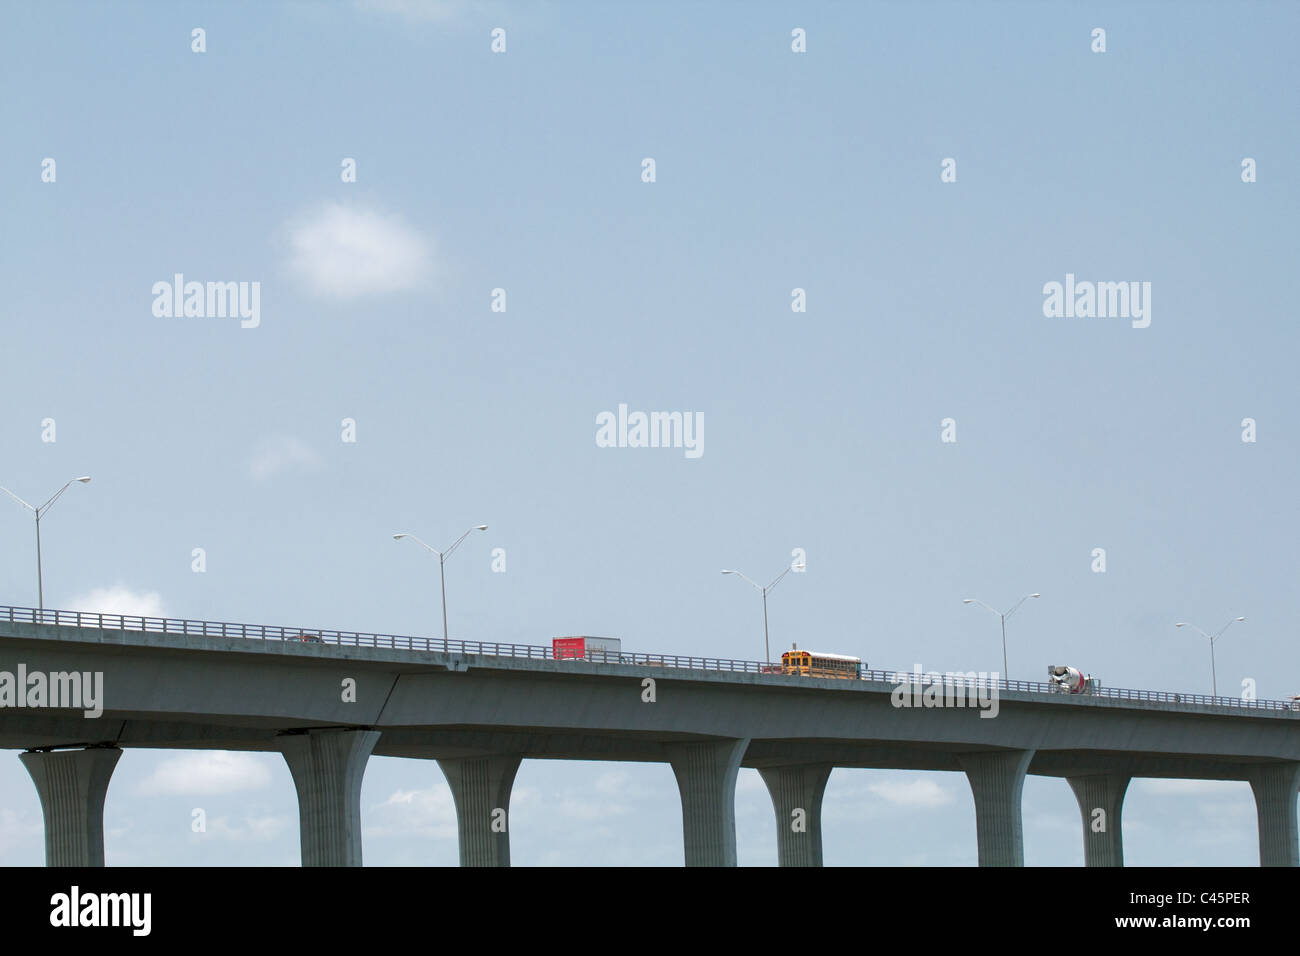 motor vehicles on high bridge - Stock Image